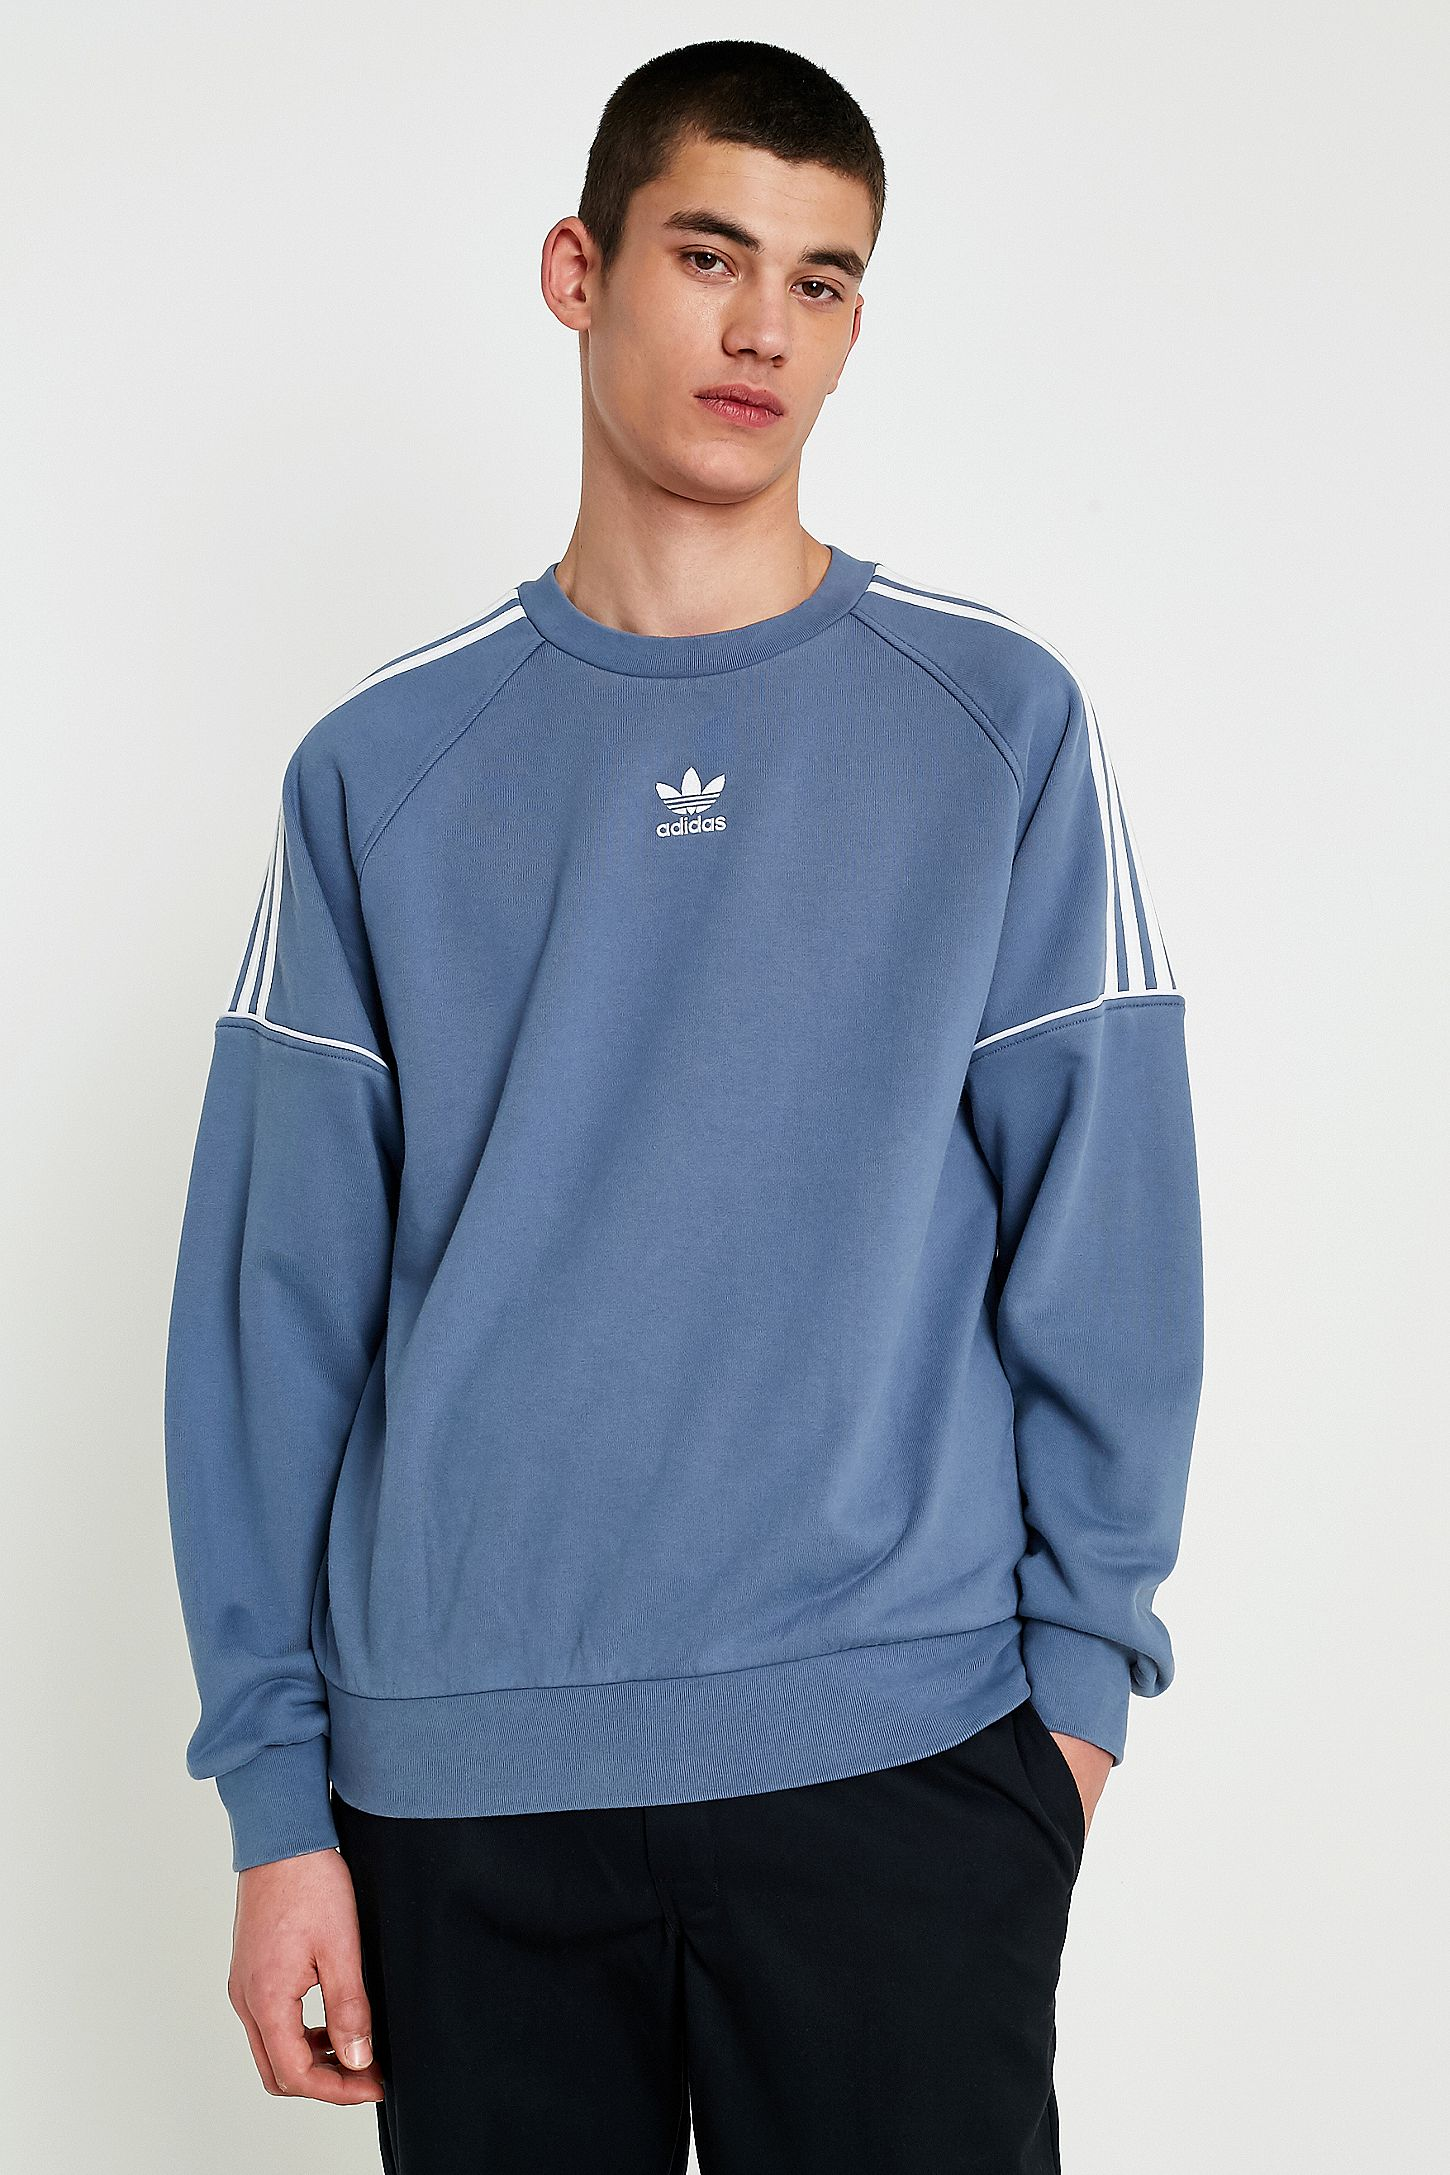 adidas Pipe Sweatshirt Black | adidas US